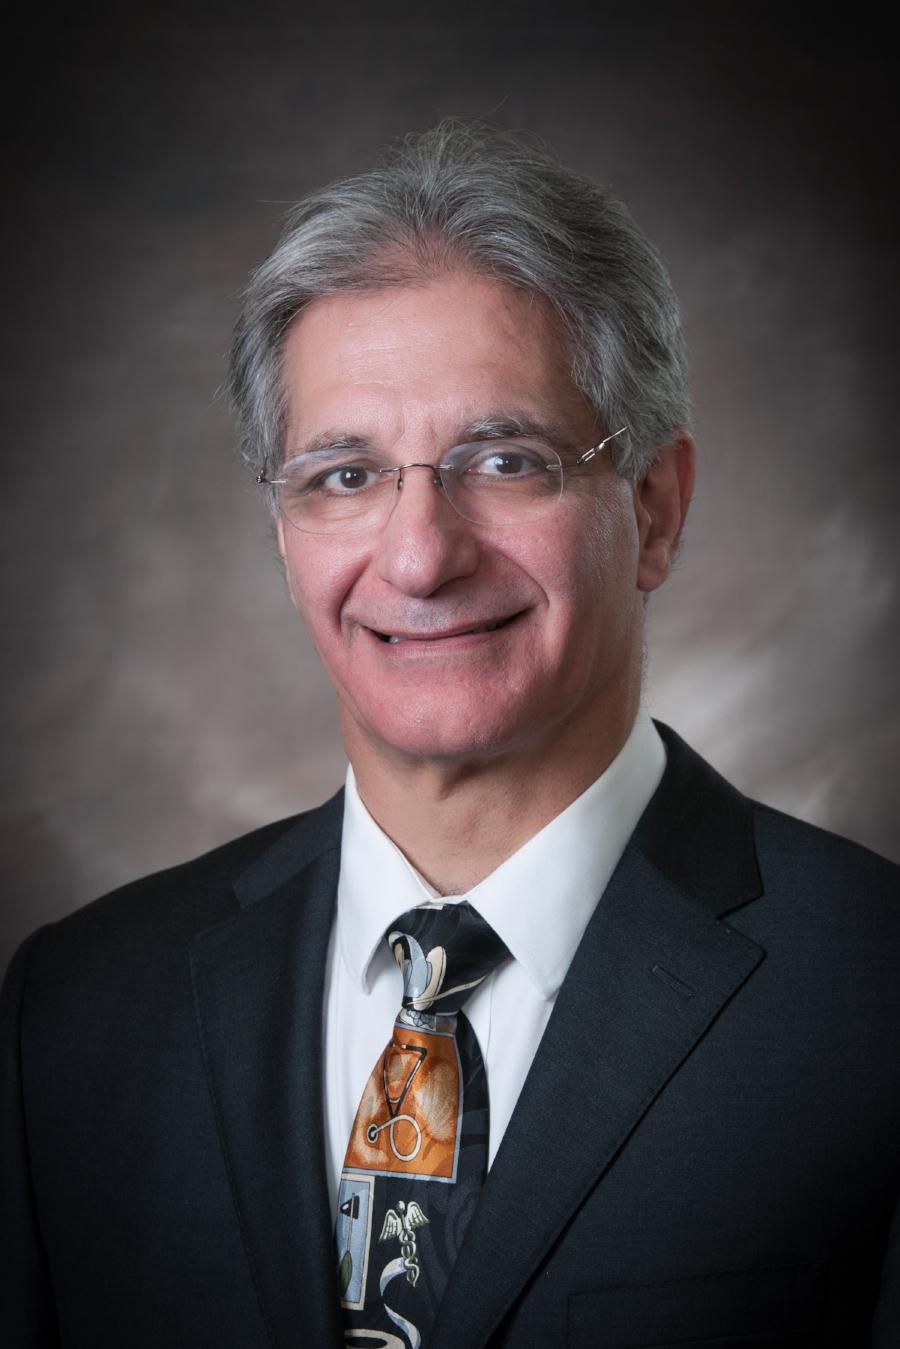 Board-Certified Plastic Surgeon,Dr. Enrique Silberblatt. He's located at his CoolSculpting practice in Roanoke, VA.